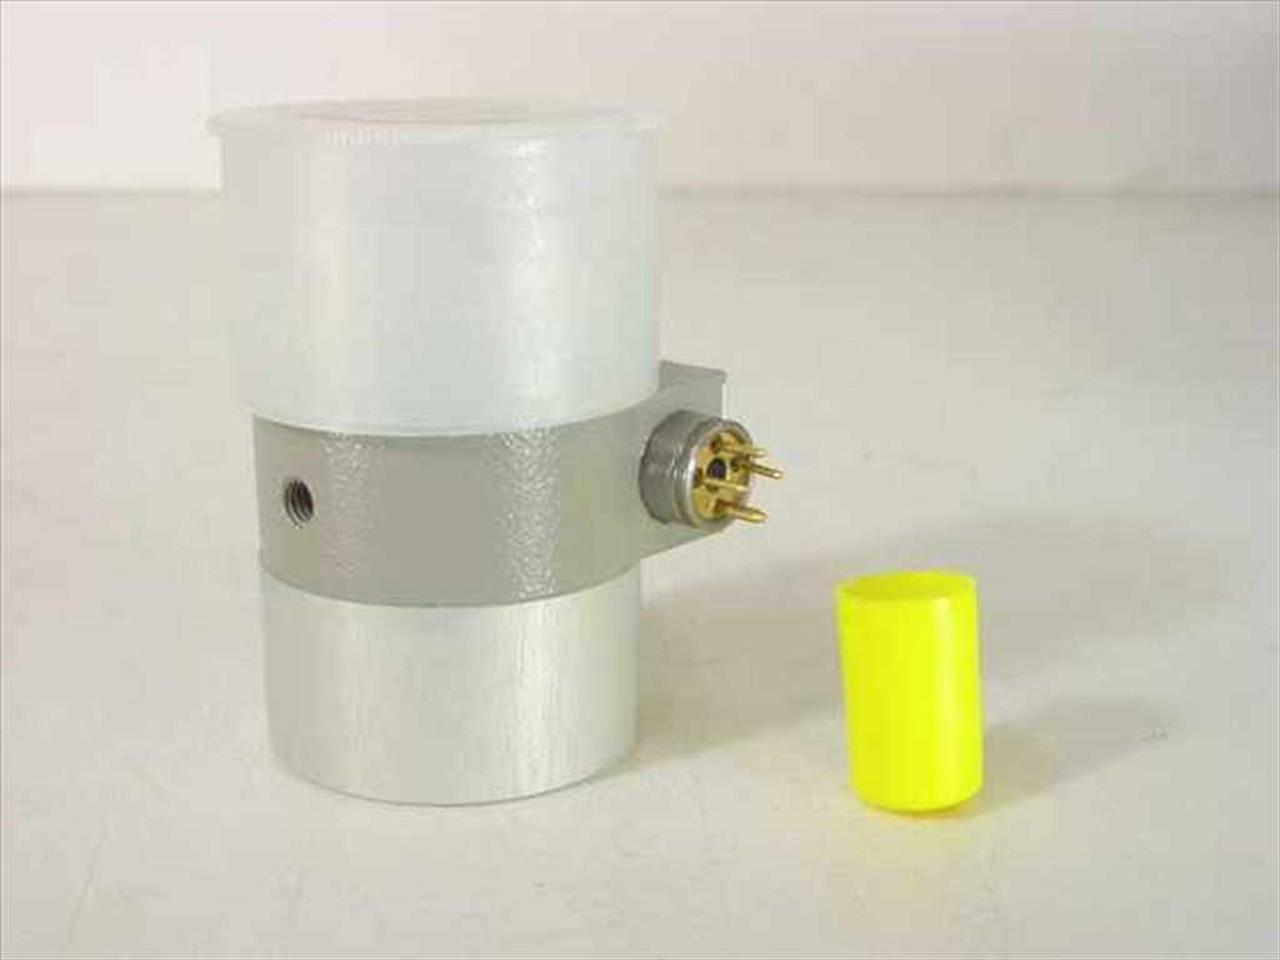 hbm q-11 wagezelle load cell 50g 16mv/